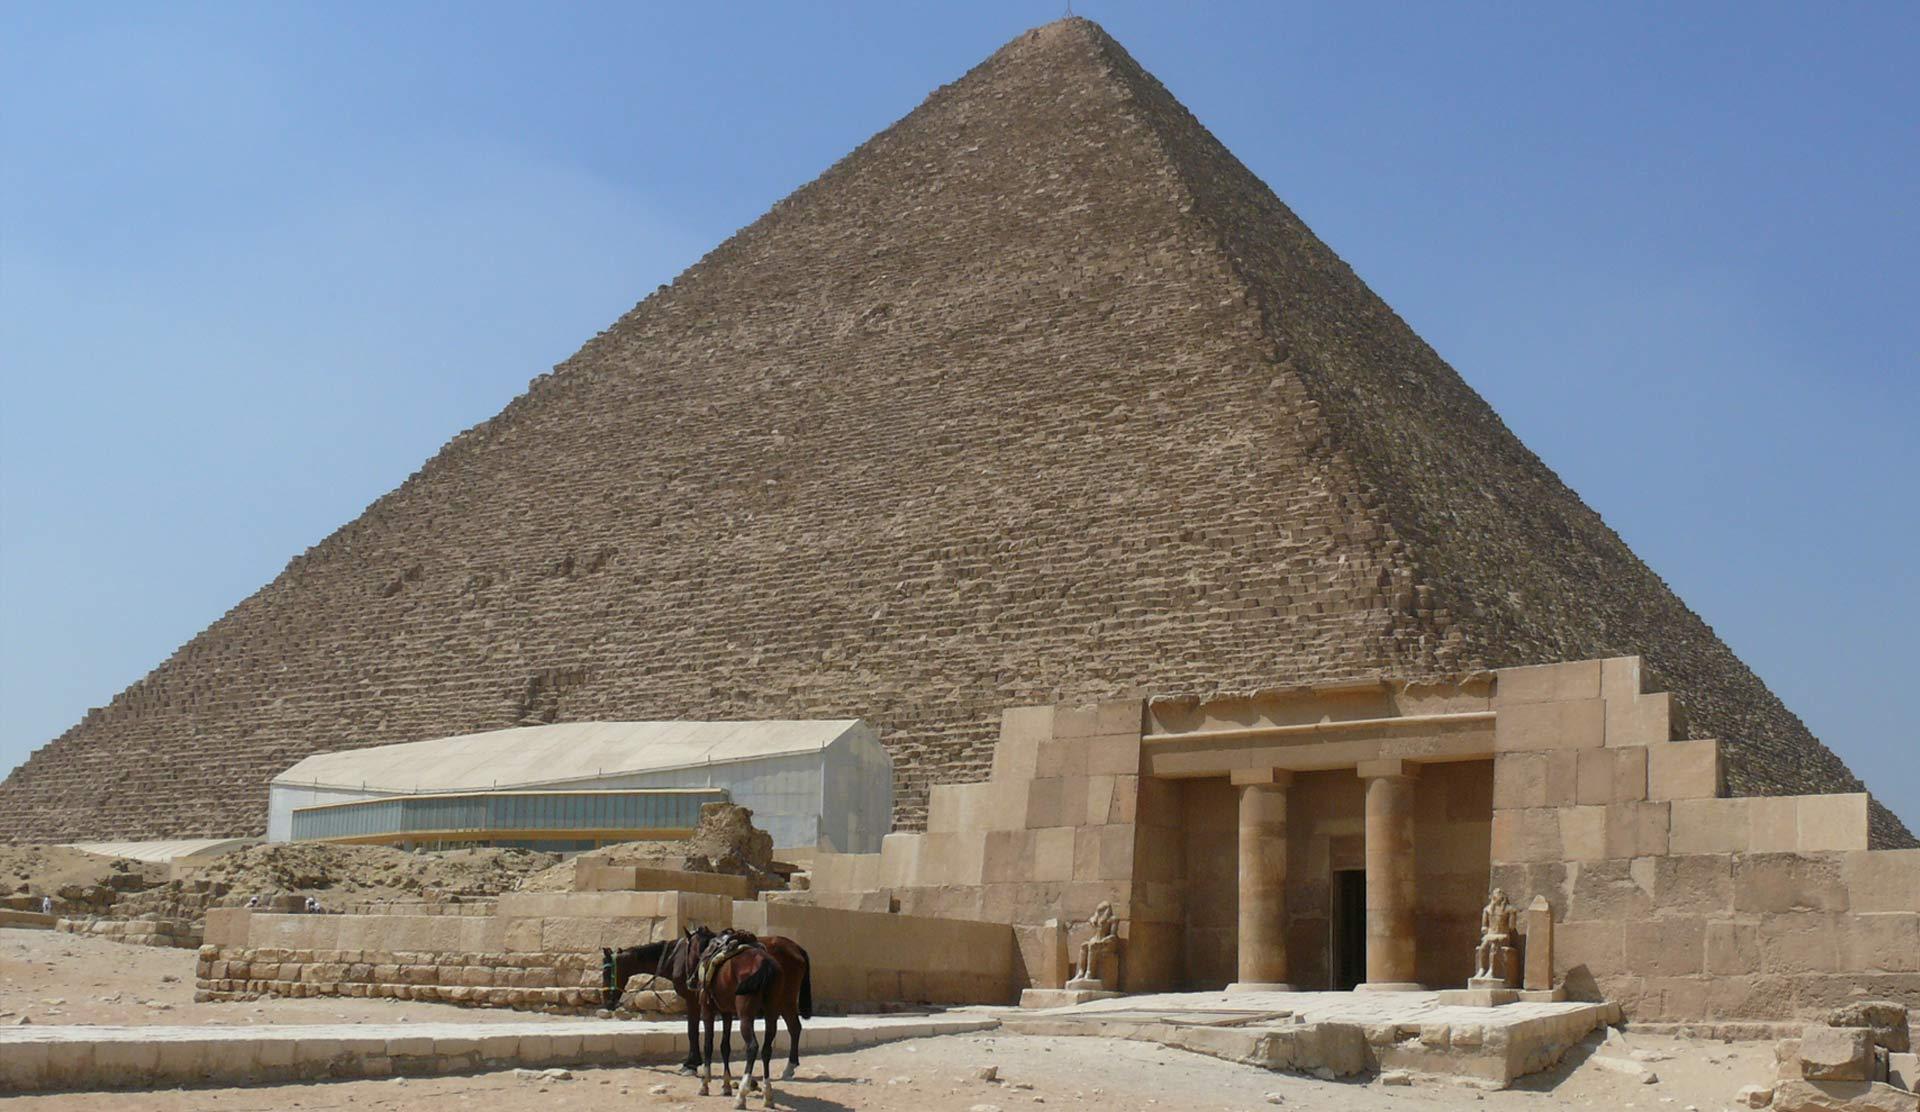 esquema de pirâmide